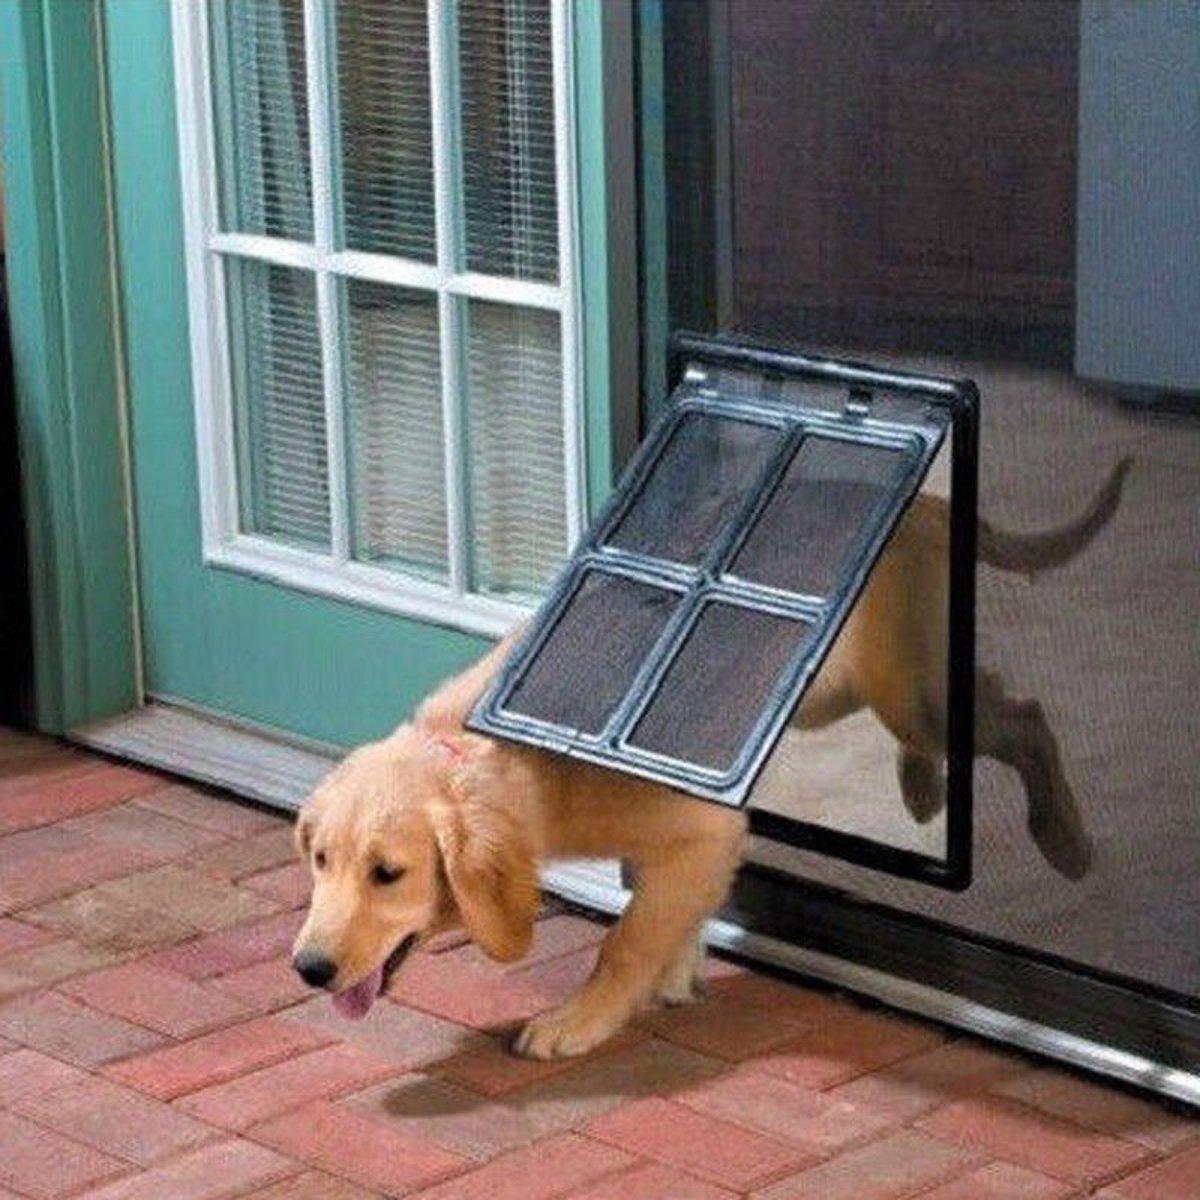 HITSAN Dog Cat Pet Large Screen Door 2-Way Flap Lock Gate Way for Window Security Black One Piece